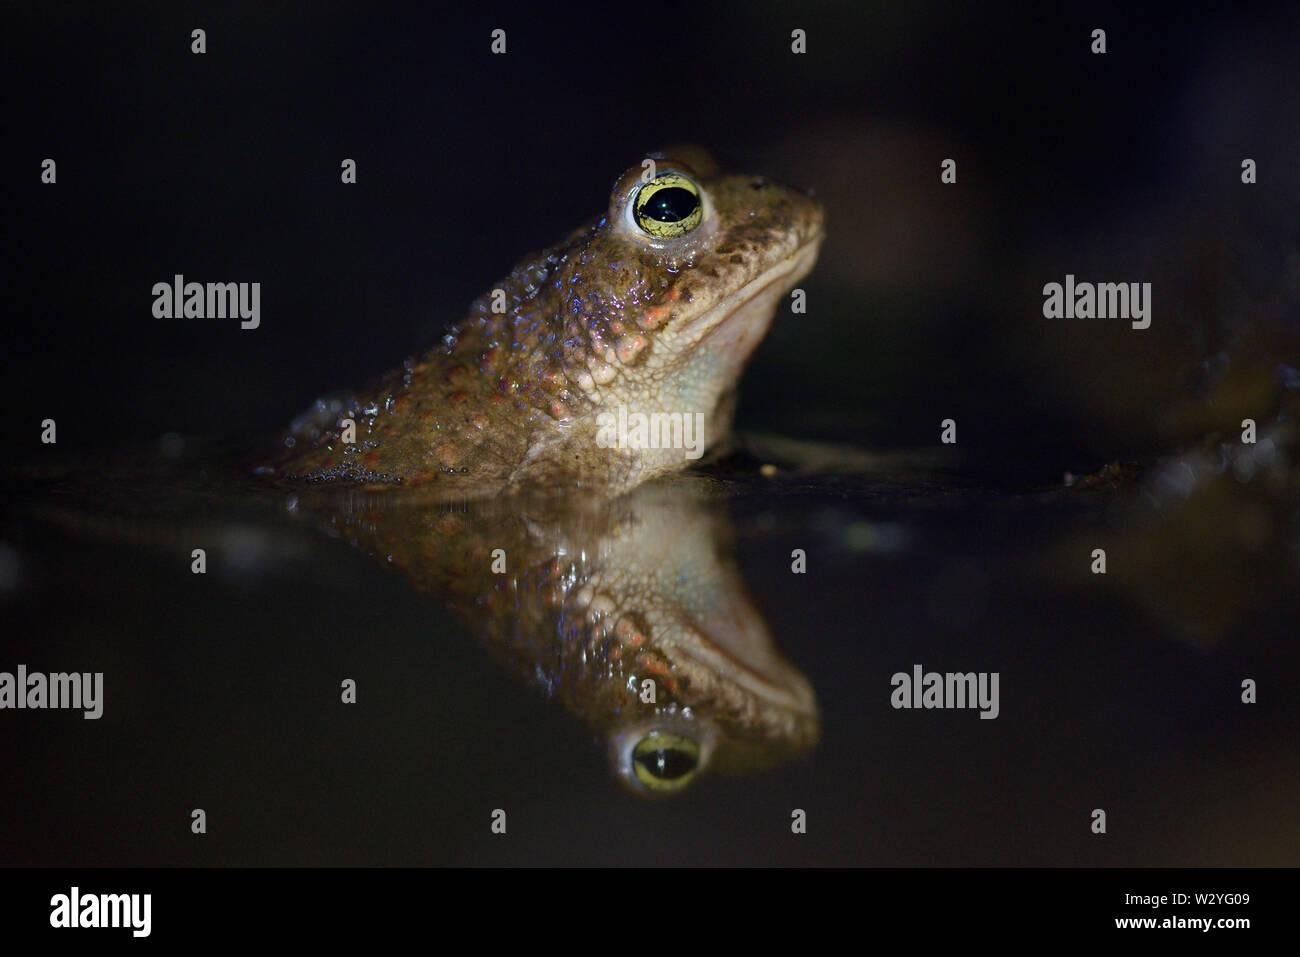 Natterjack toad, male, may, Duisburg, Ruhr Area, North Rhine-Westphalia, Germany,  (Epidalea calamita) Stock Photo